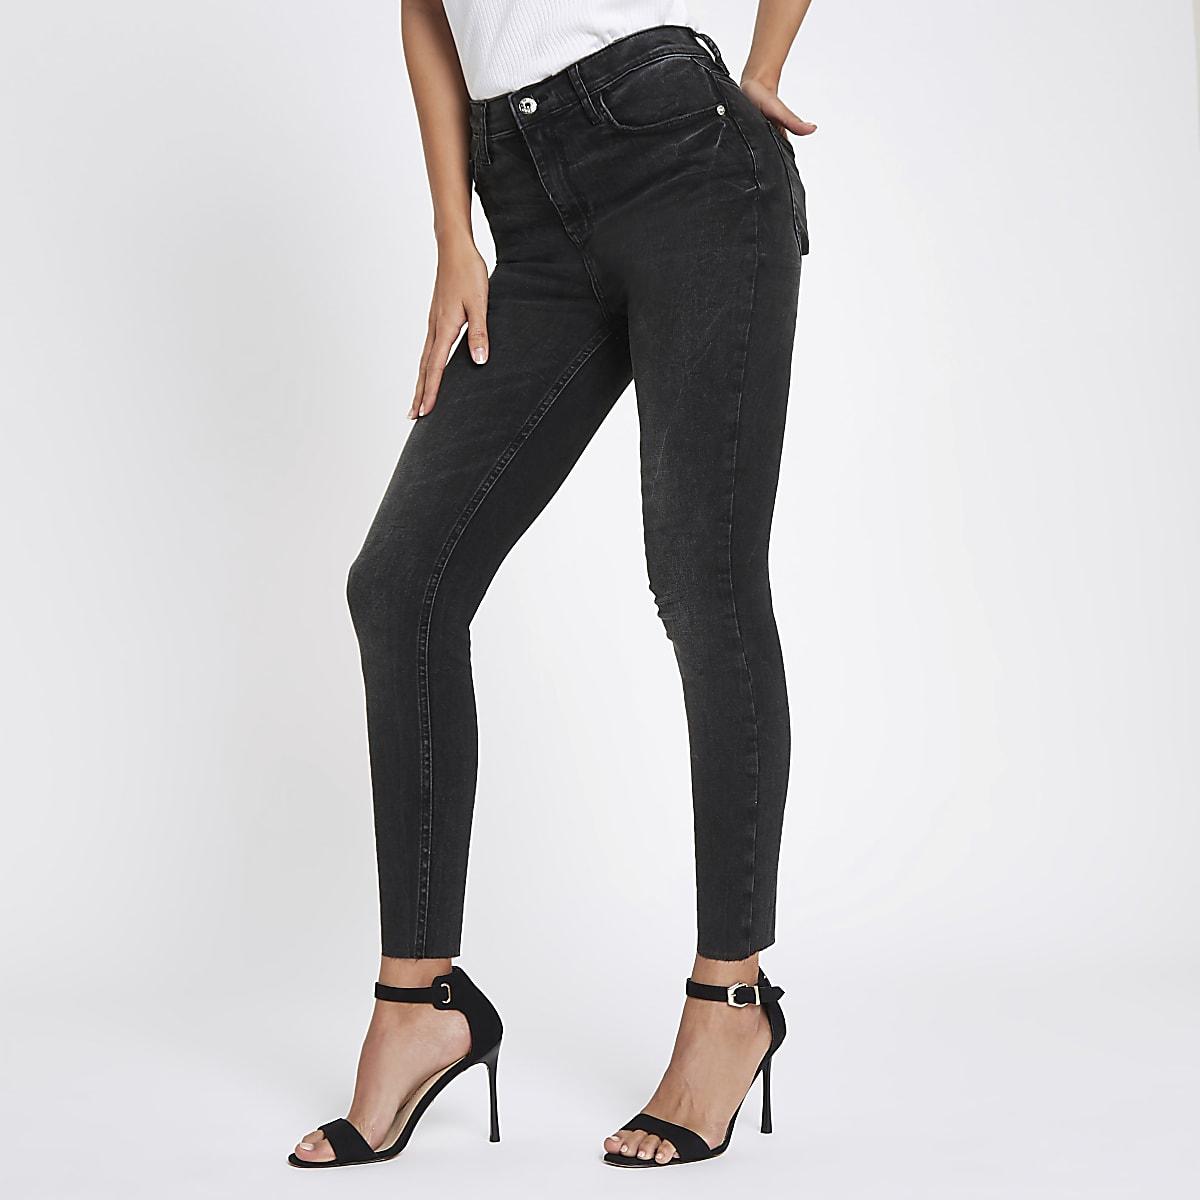 Rl Grazer Black Harper Ankle Jeans mvNn0w8